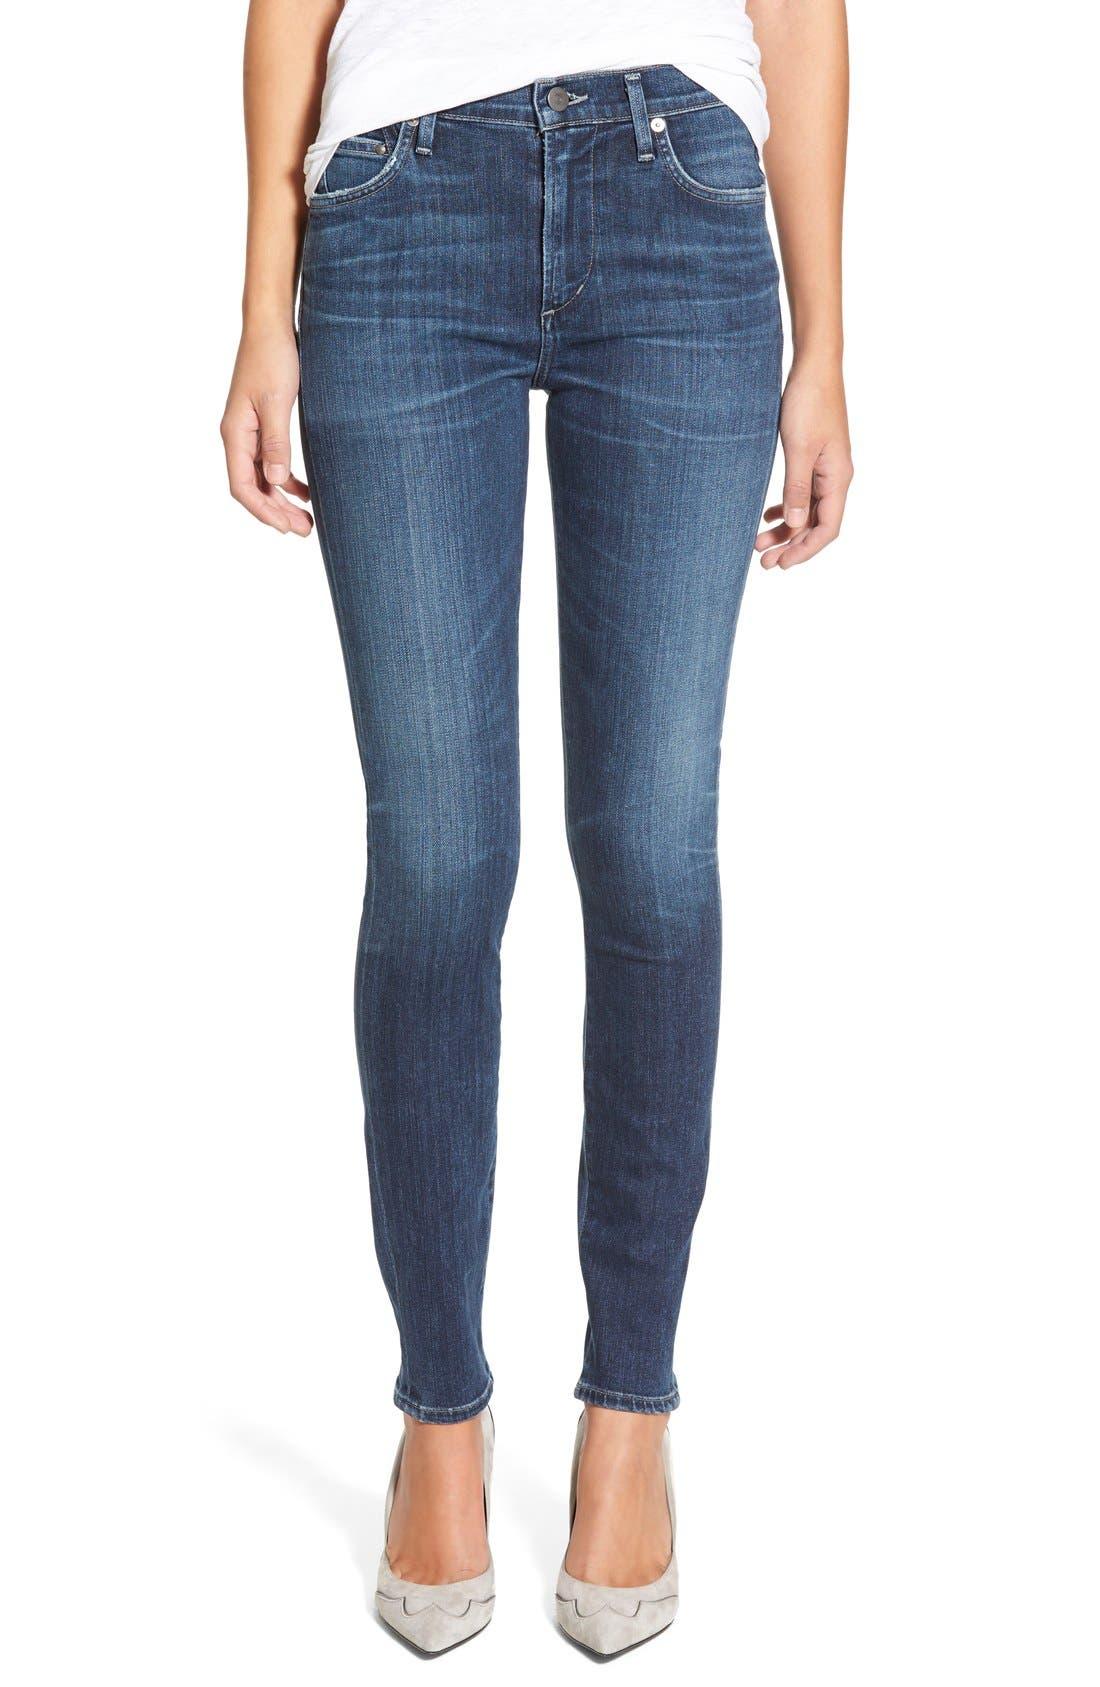 Rocket High WaistSkinny Jeans,                         Main,                         color, Albion